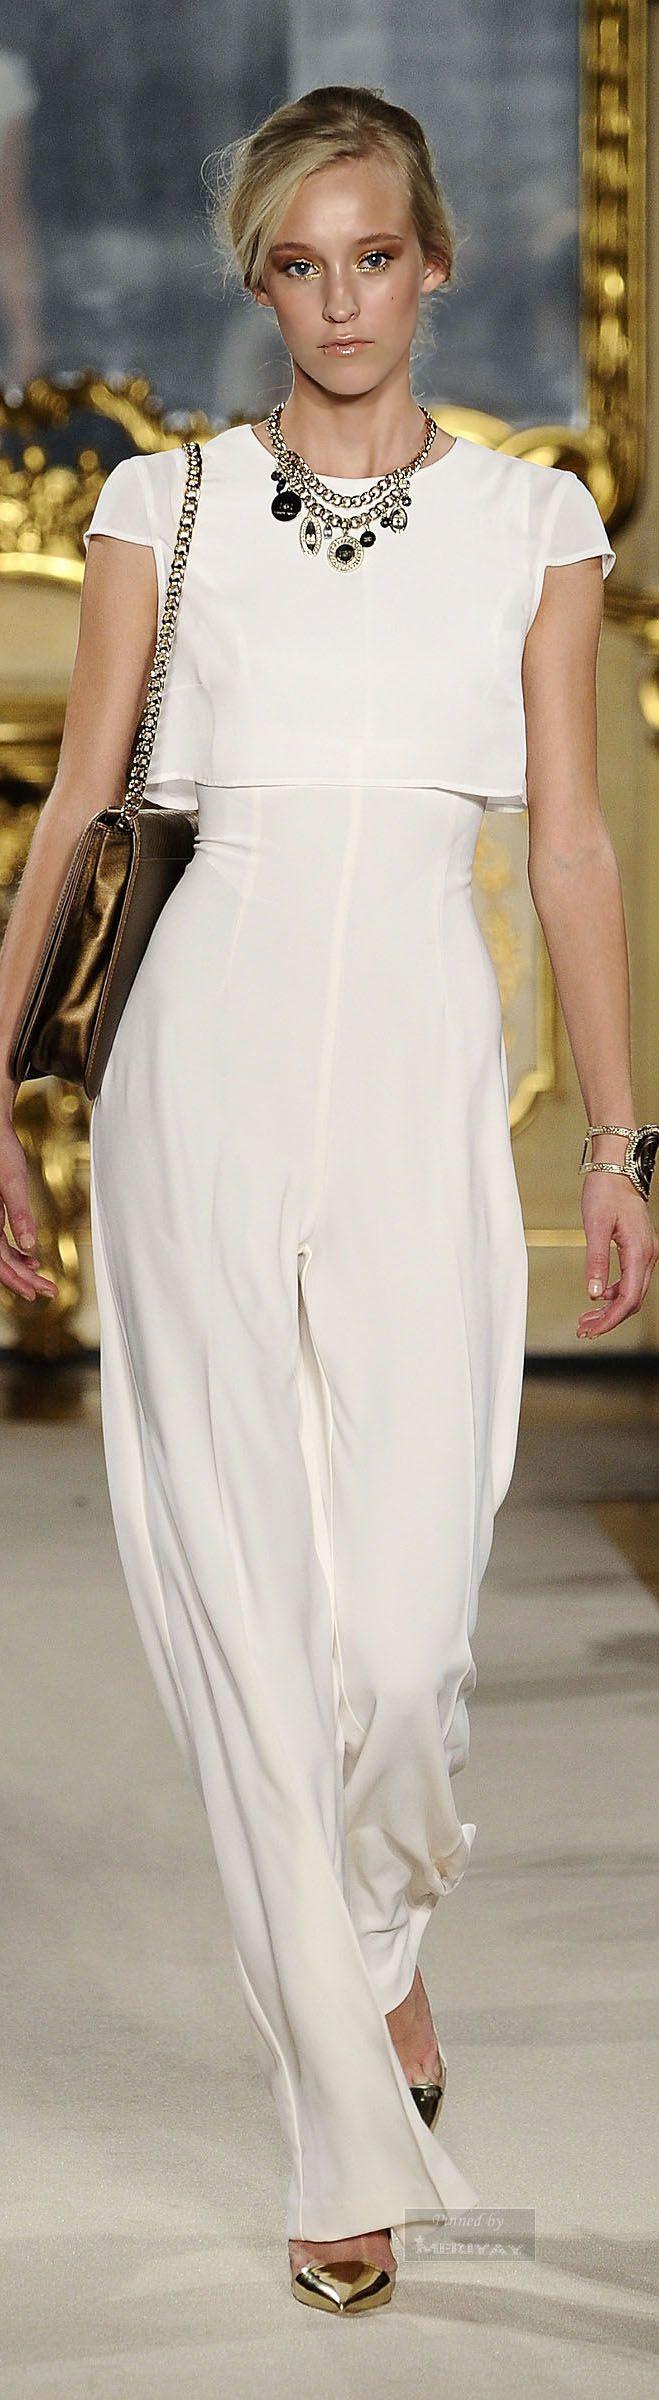 White out glamour/karen cox..Elisabetta Franchi, S/S 2015.